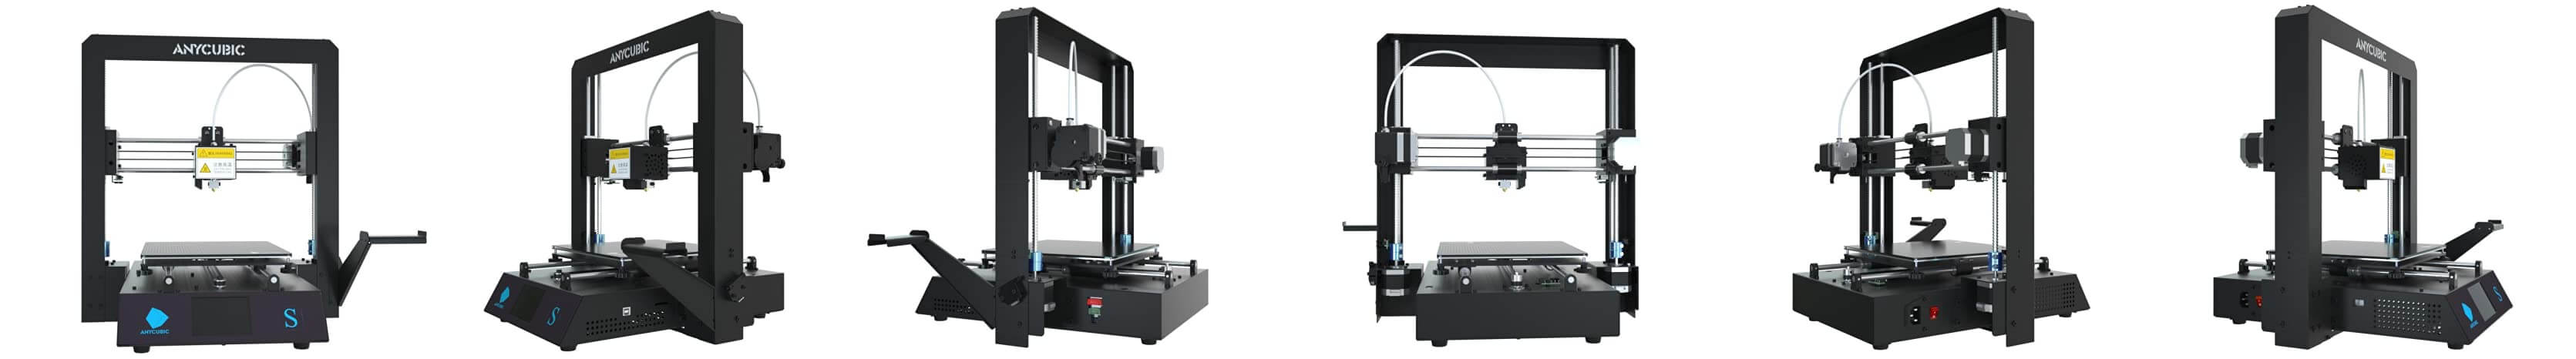 impresora 3d anycubic